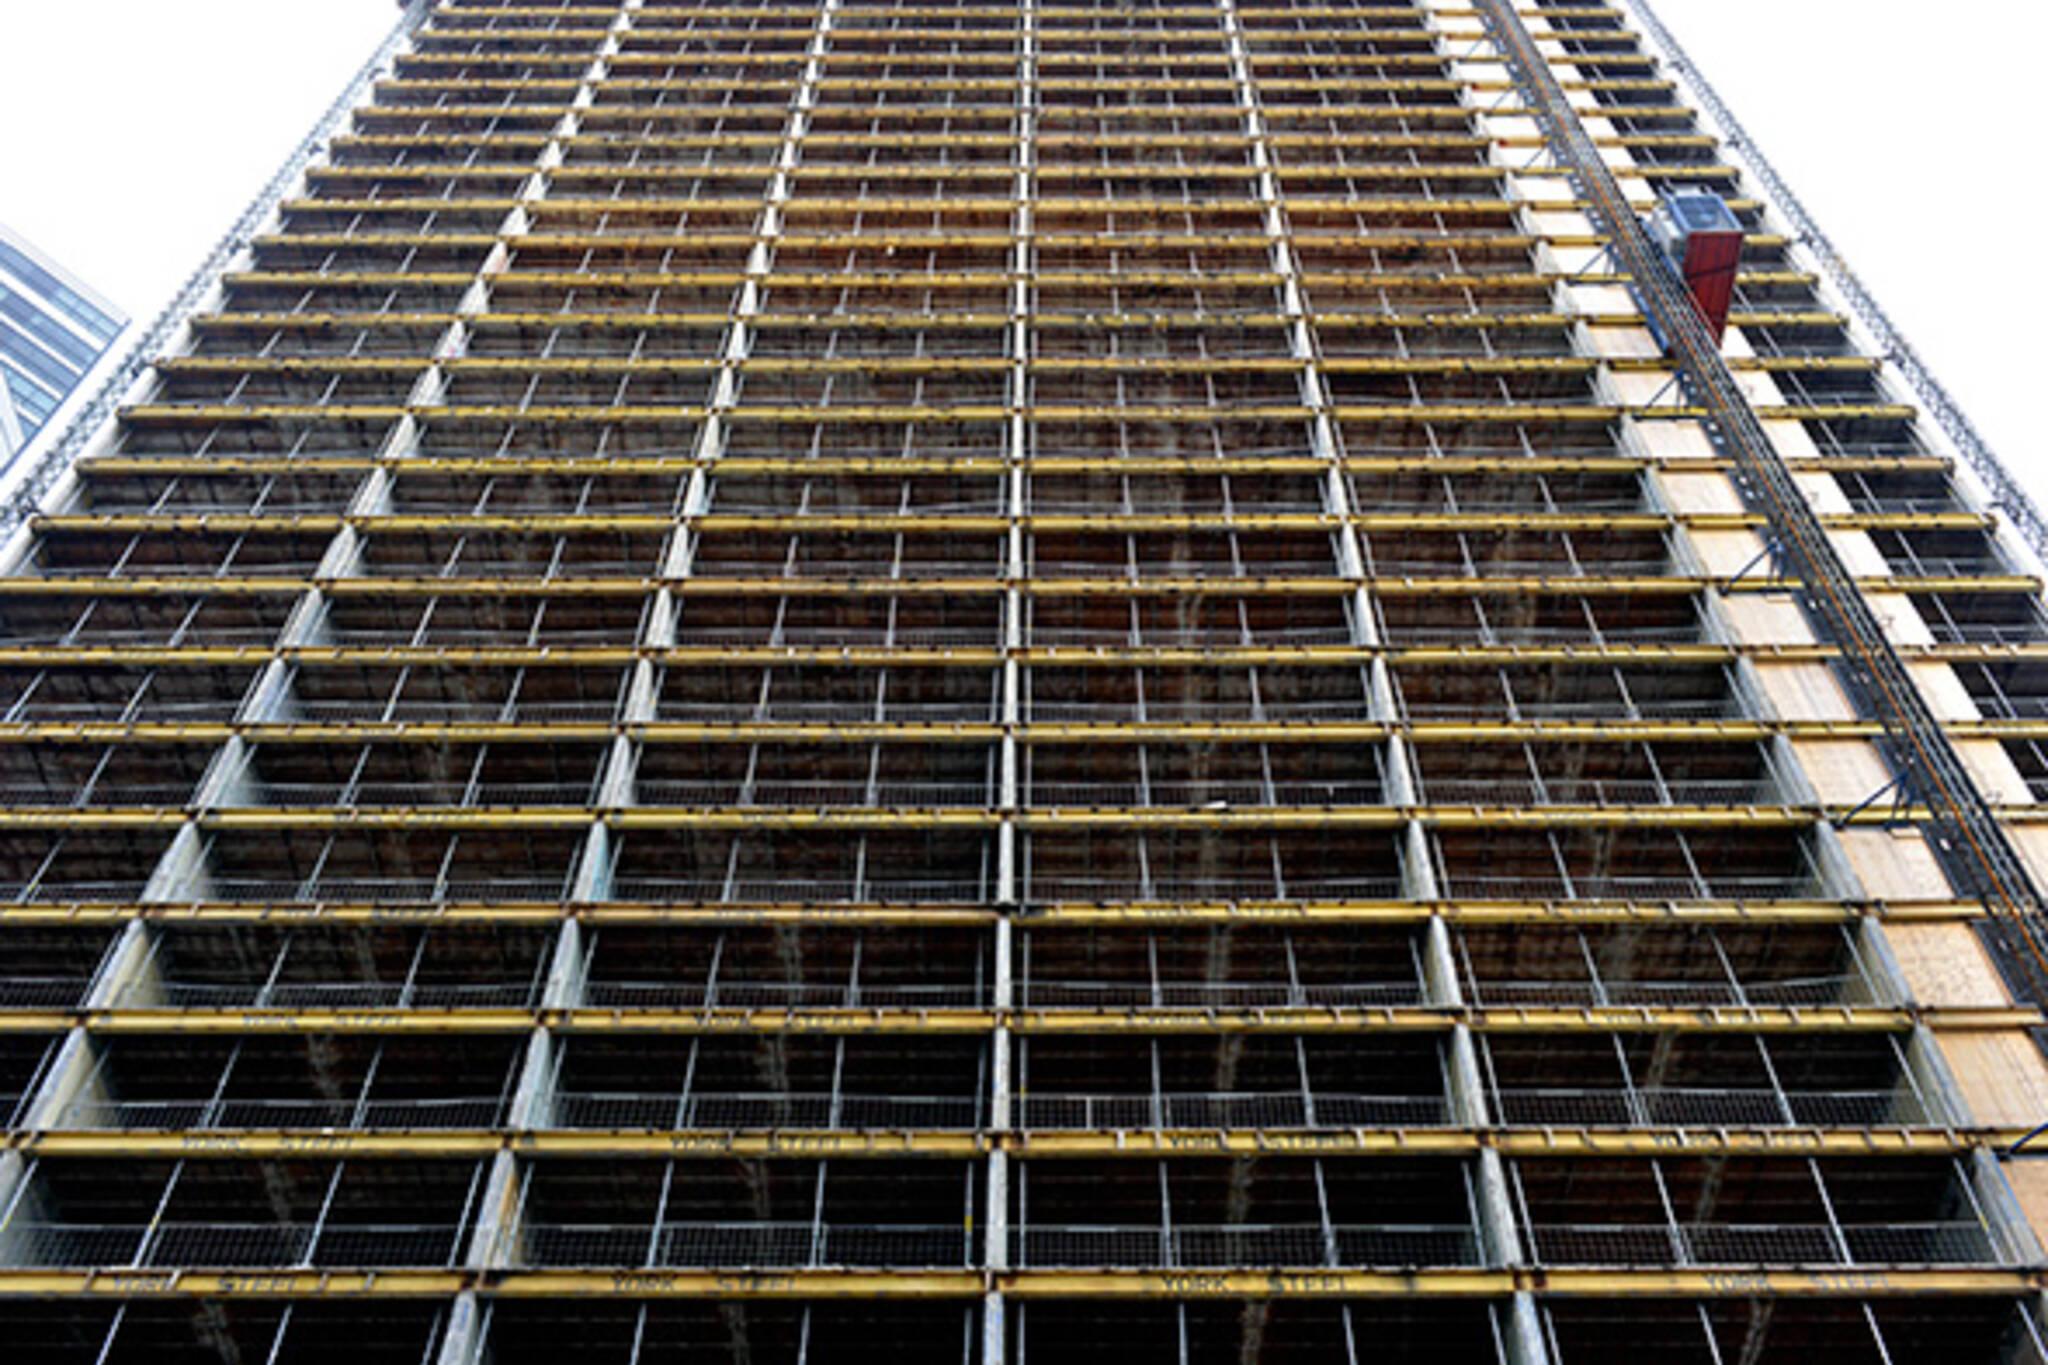 sutton place condo construction